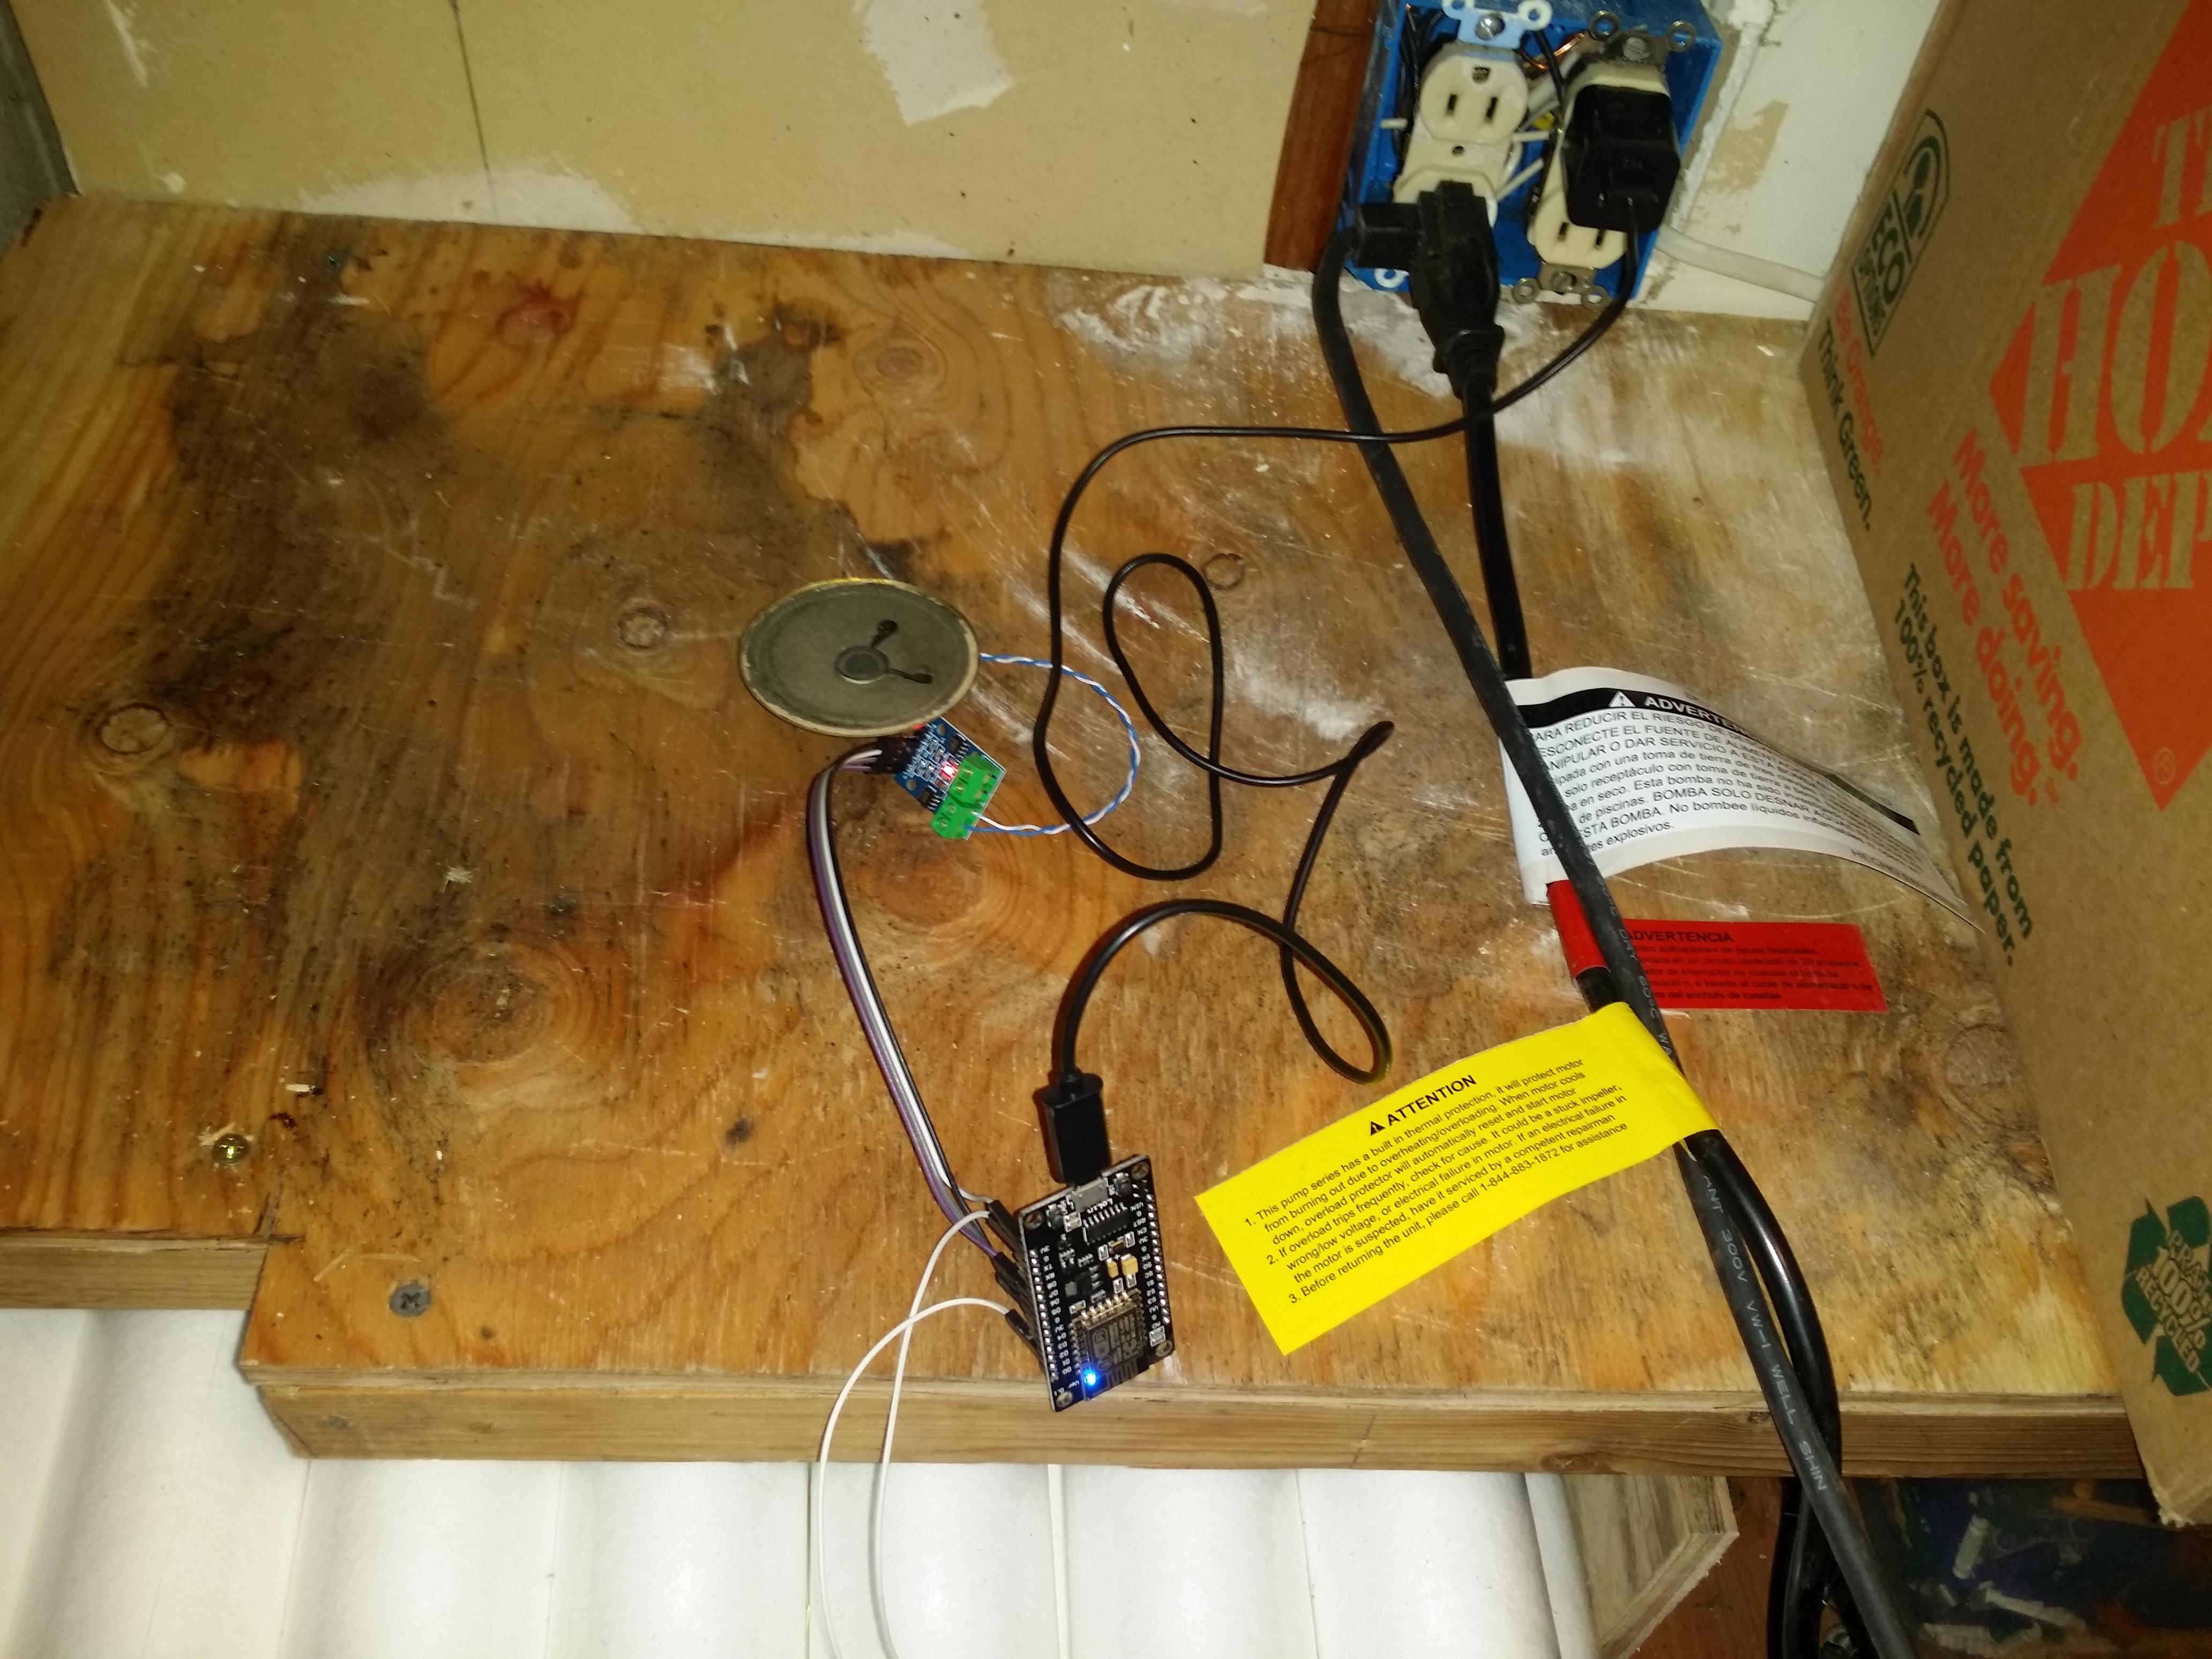 A Wireless Sump Pump Not Working Alarm Using MicroPython and NodeMCU